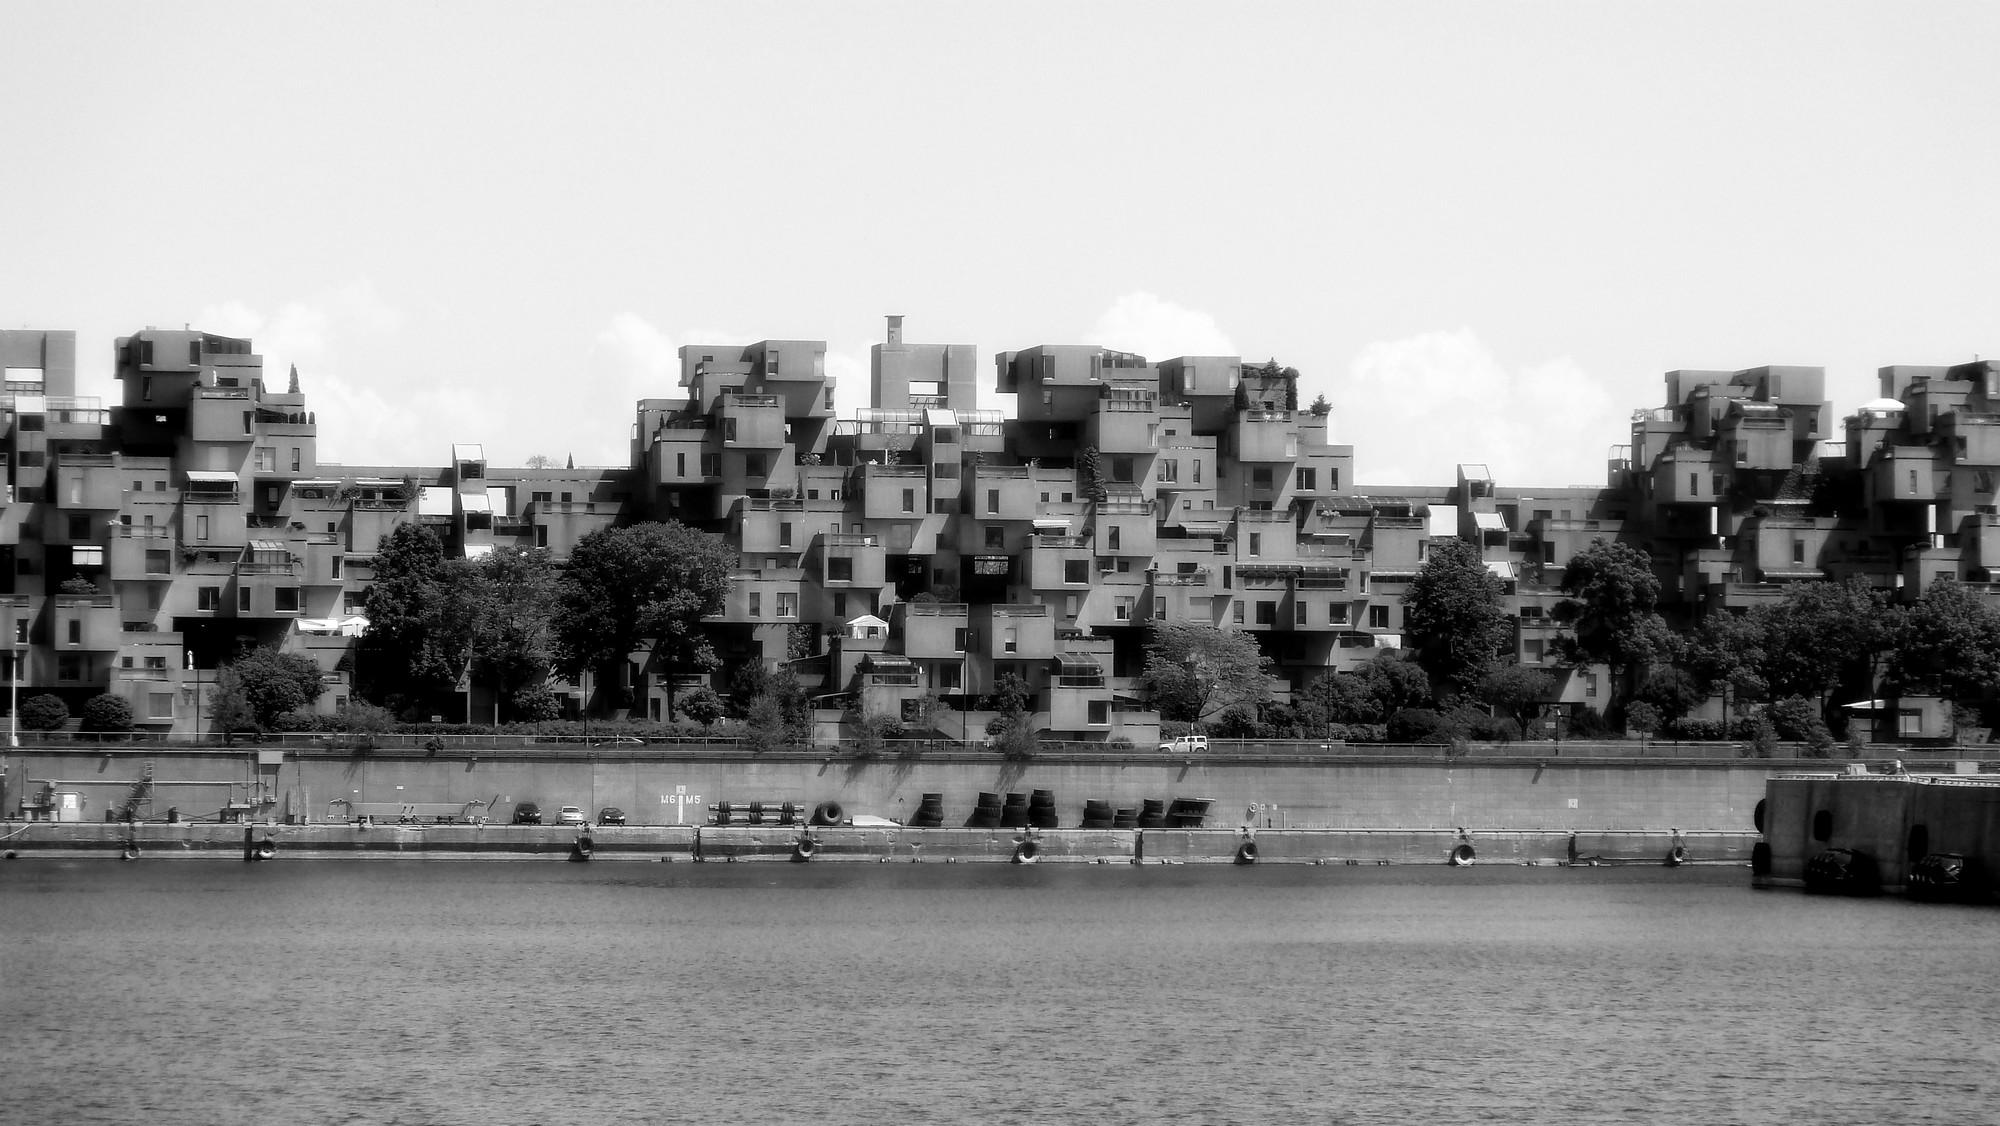 Clásicos de Arquitectura: Hábitat 67 / Moshe Safdie, © Juan Muñoz